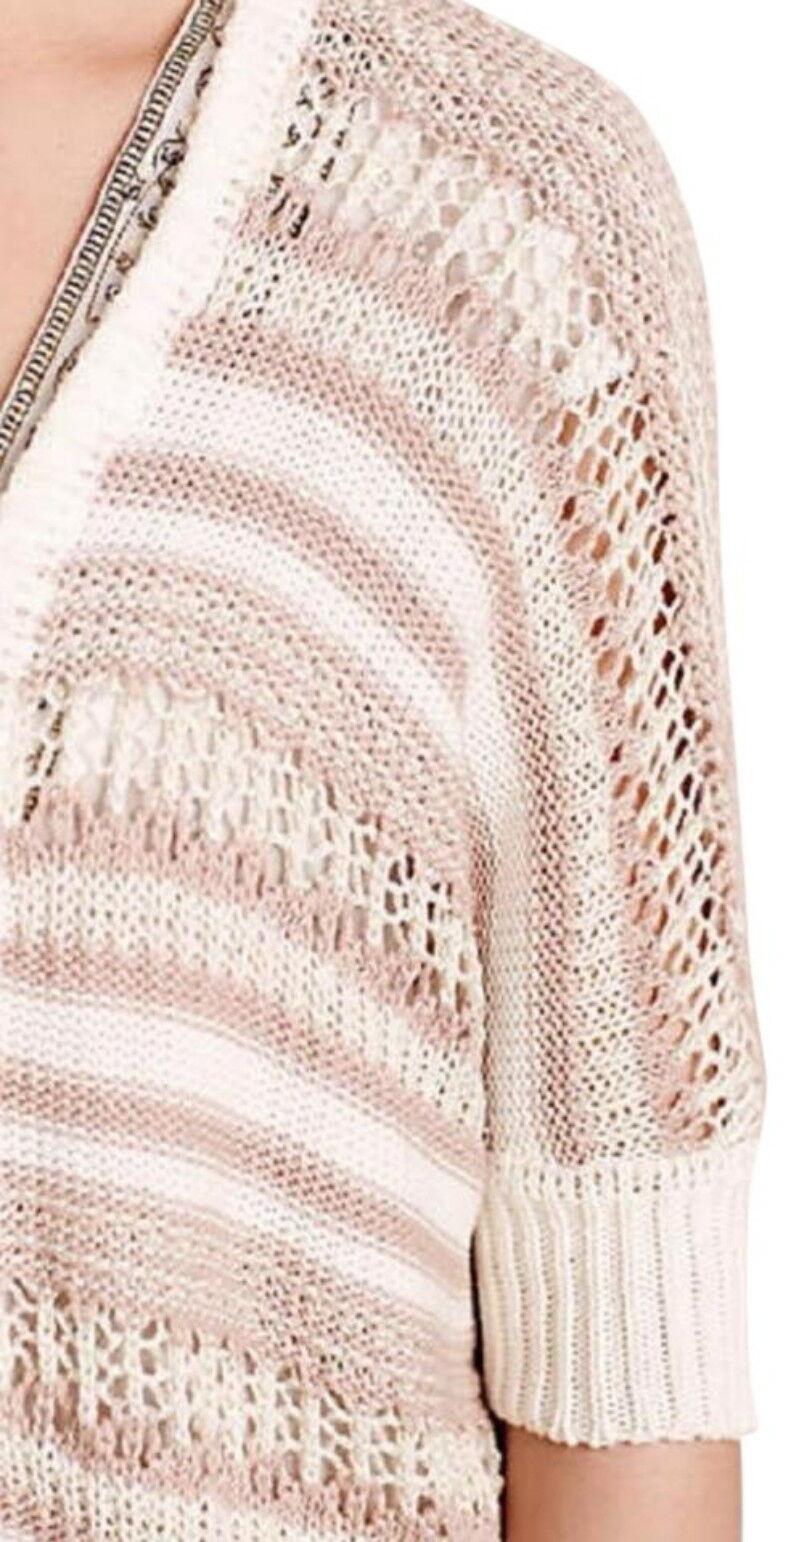 Anthropologie Sparkly Me Cardigan Cardigan Cardigan XSmall Small 0 2 4 6 Dolman Sweater Shimmering 4b1caa